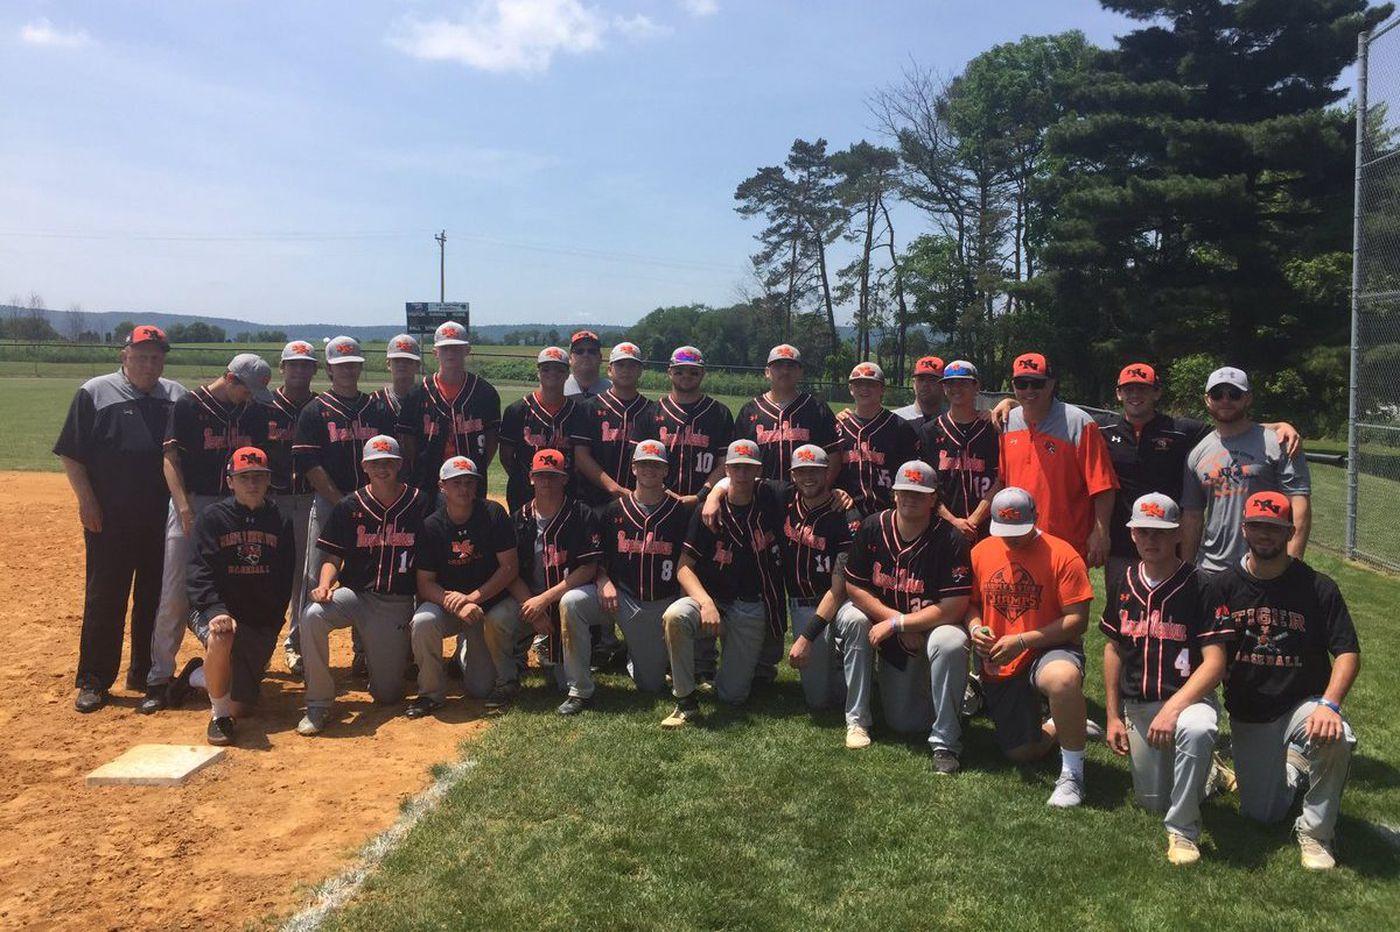 Thursday's Pa. roundup: Marple Newtown baseball advances to state semifinals